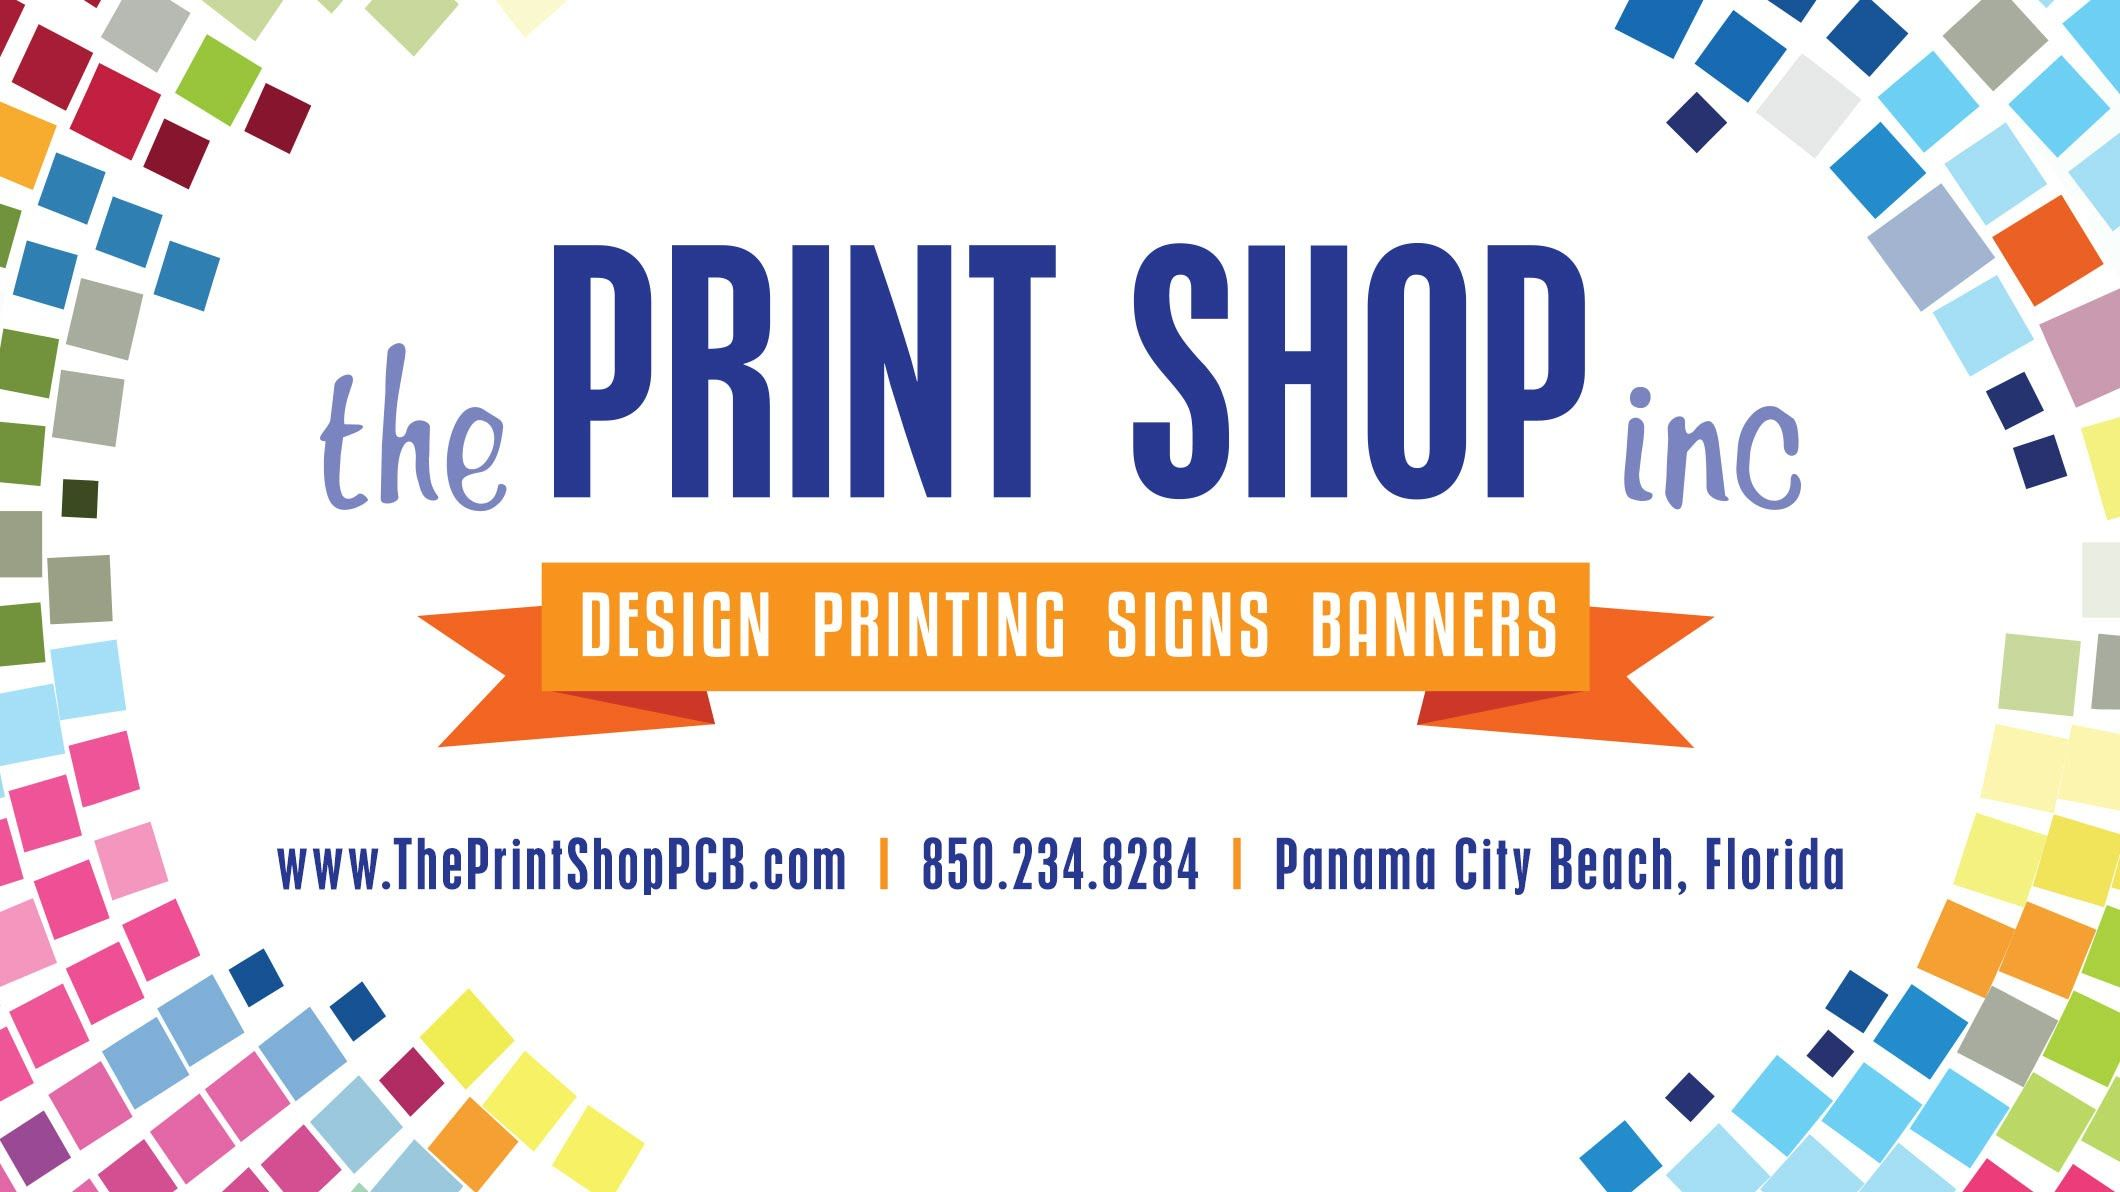 Company Business Cards Panama City 850 234 8284 Professional Company Business Cards Business Card Printer Panama City Panama